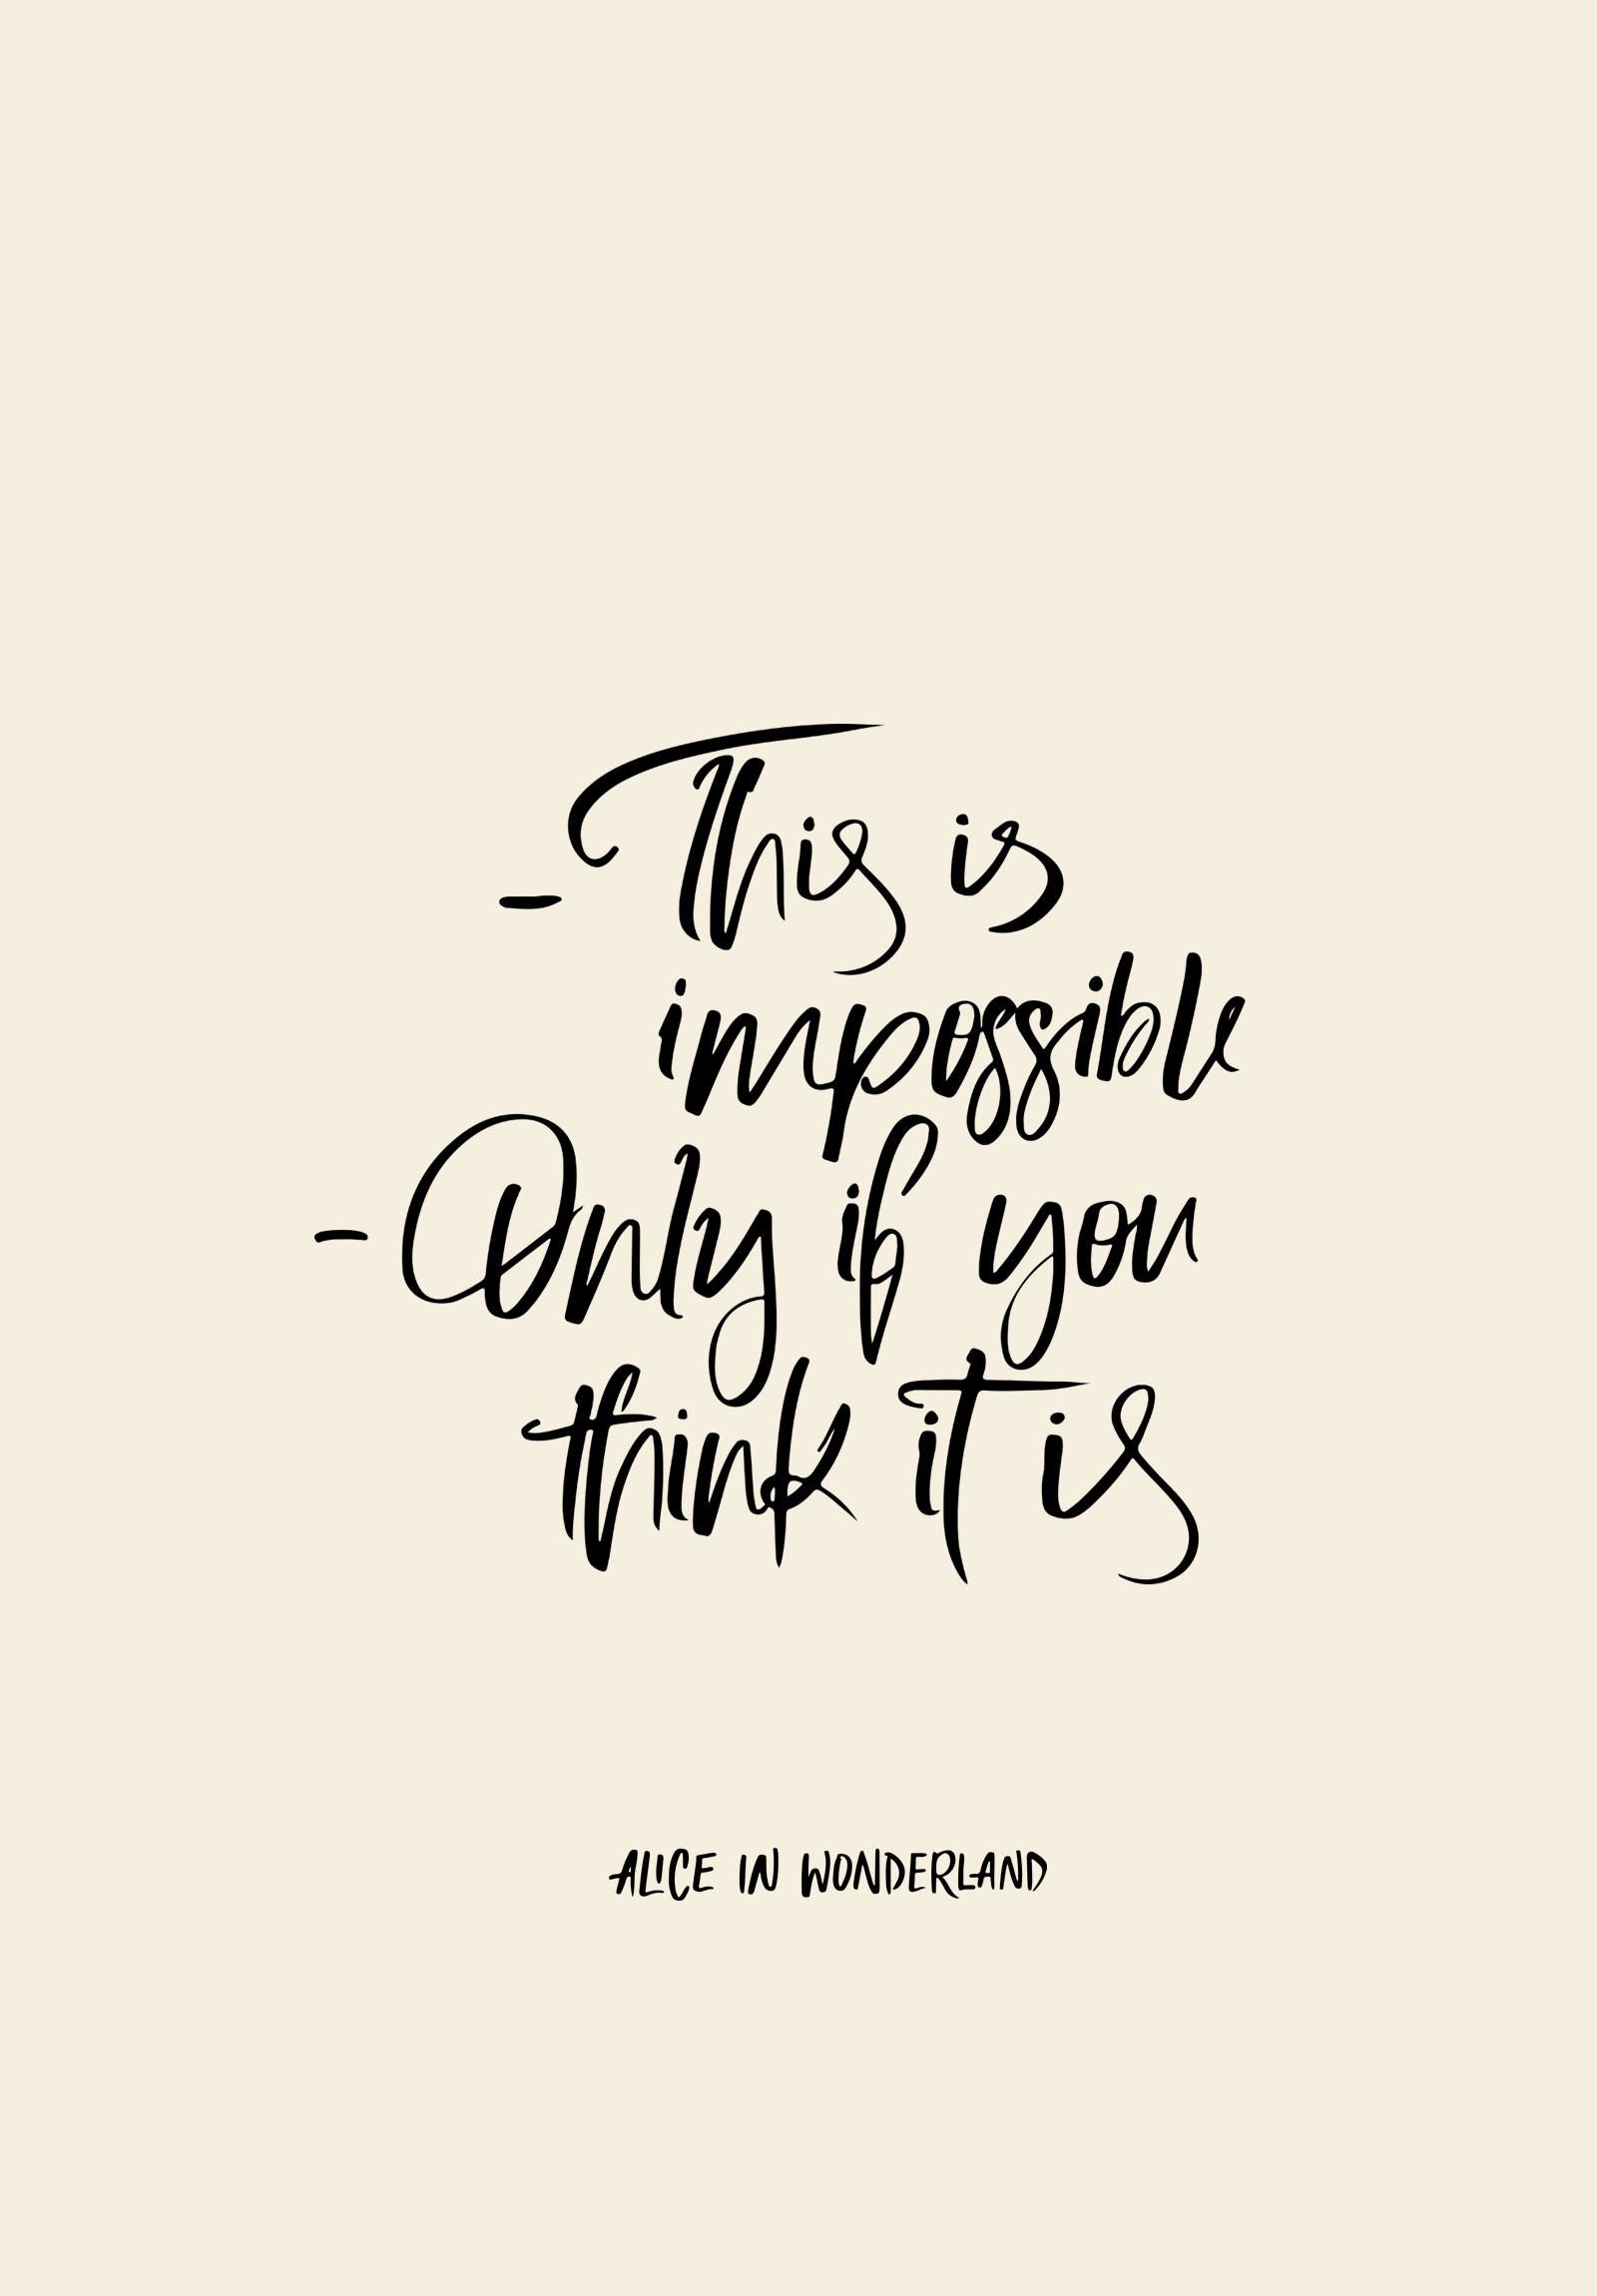 EVERYTHING IS POSSIBLE. Free Desktop WallpaperIphone WallpapersFree  Wallpaper DownloadAlice And Wonderland QuotesDisney …